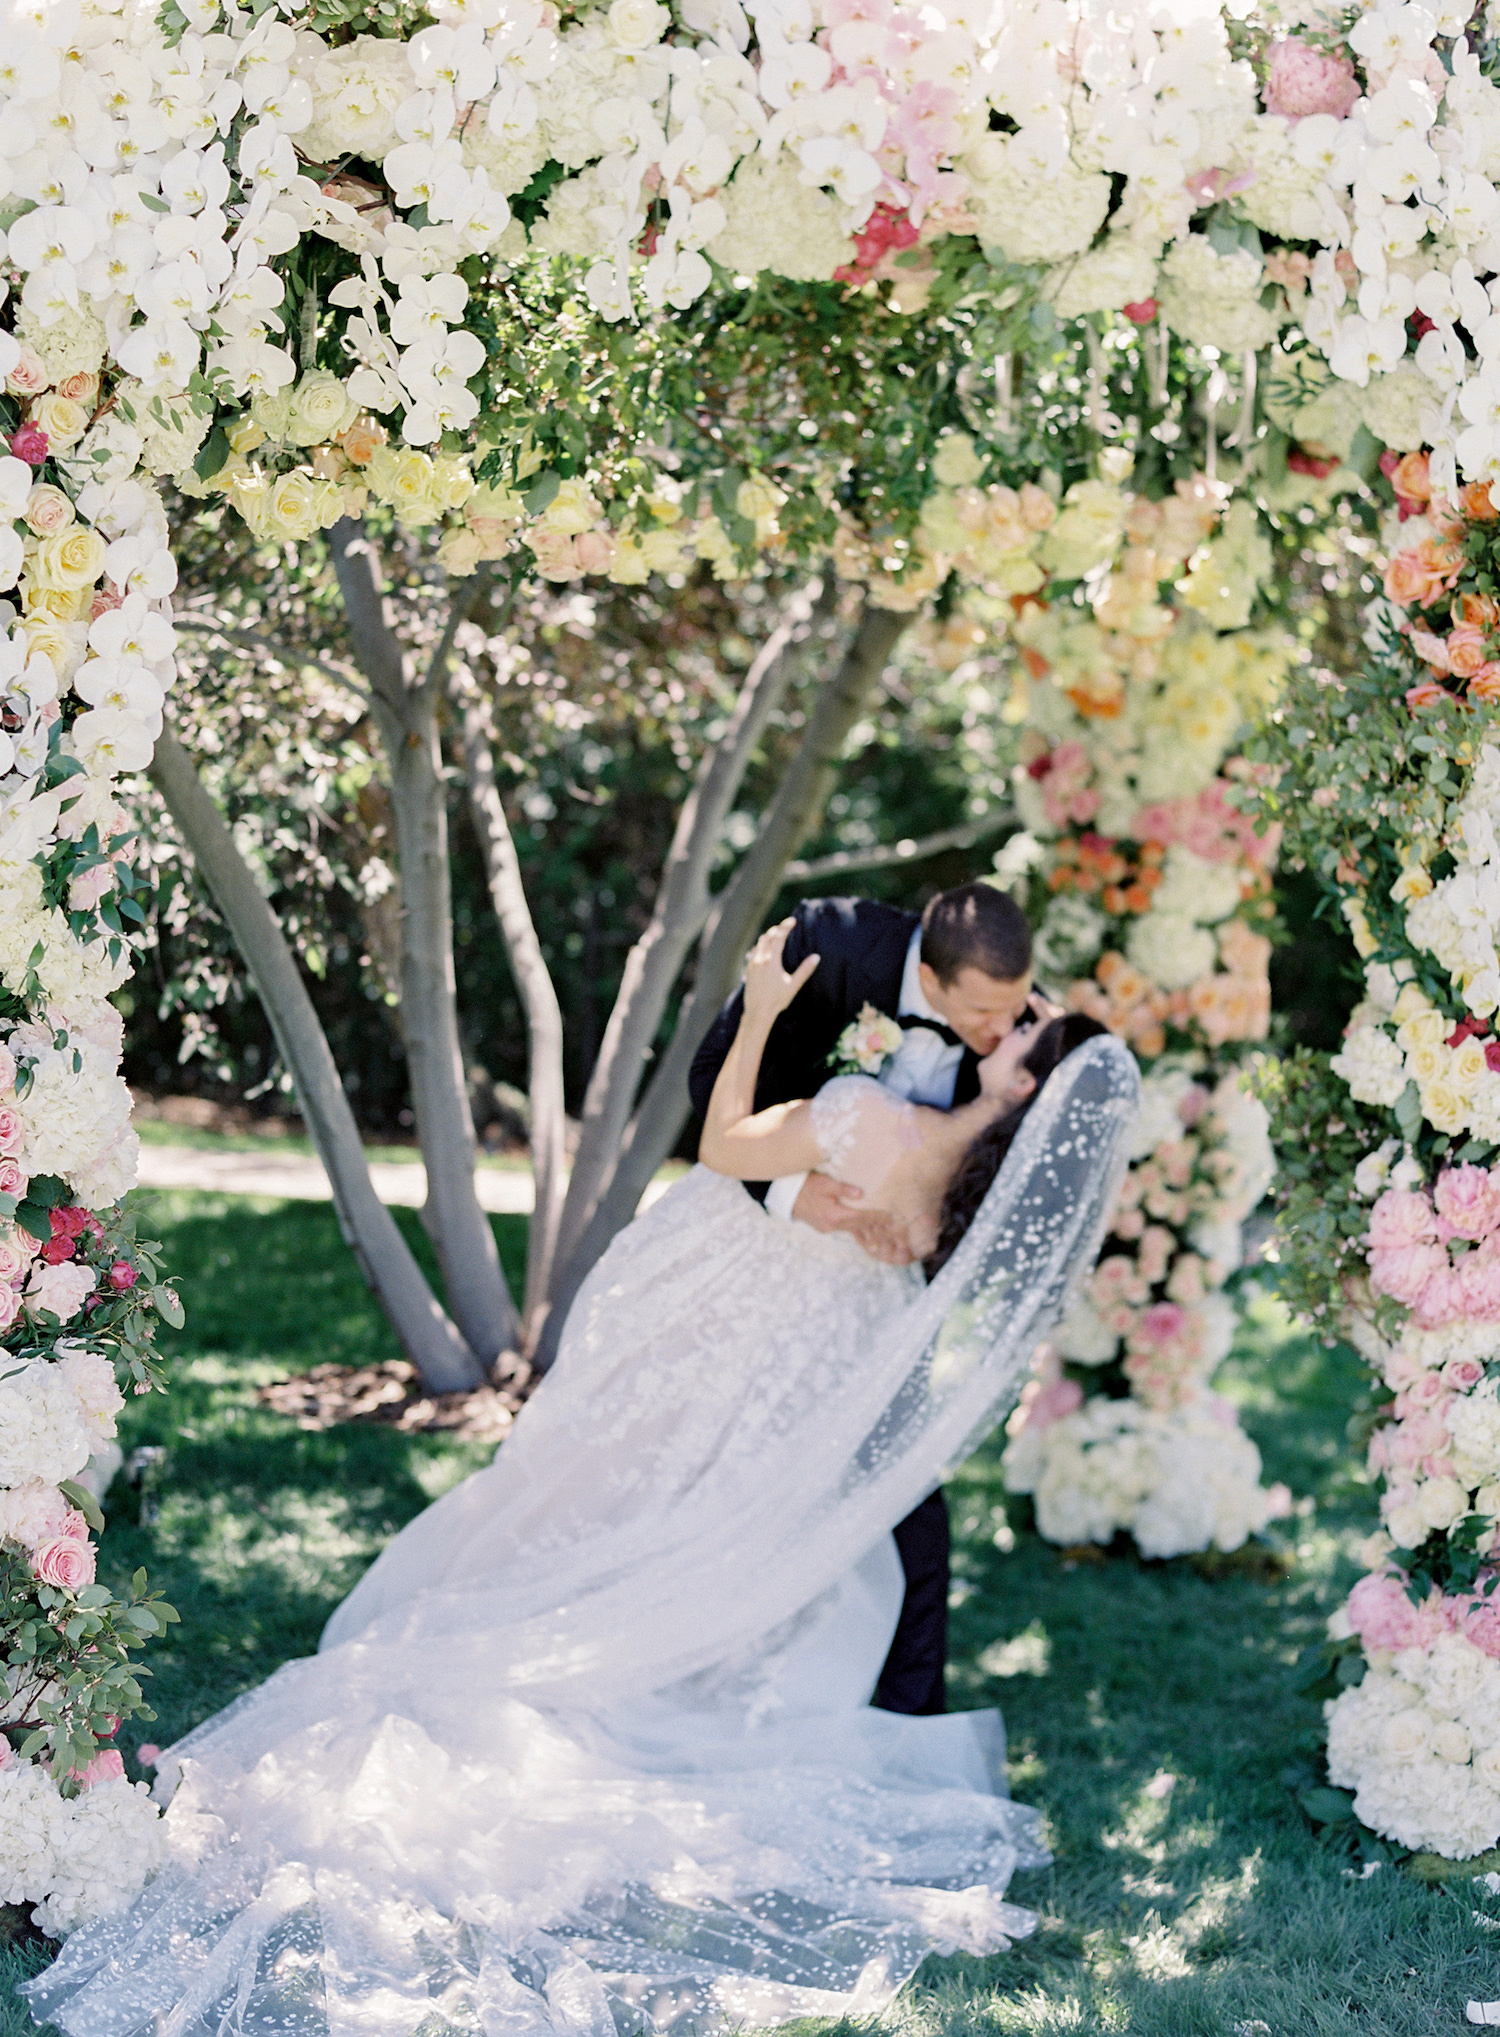 bride-and-groom-garden-wedding-under-floral-chuppah